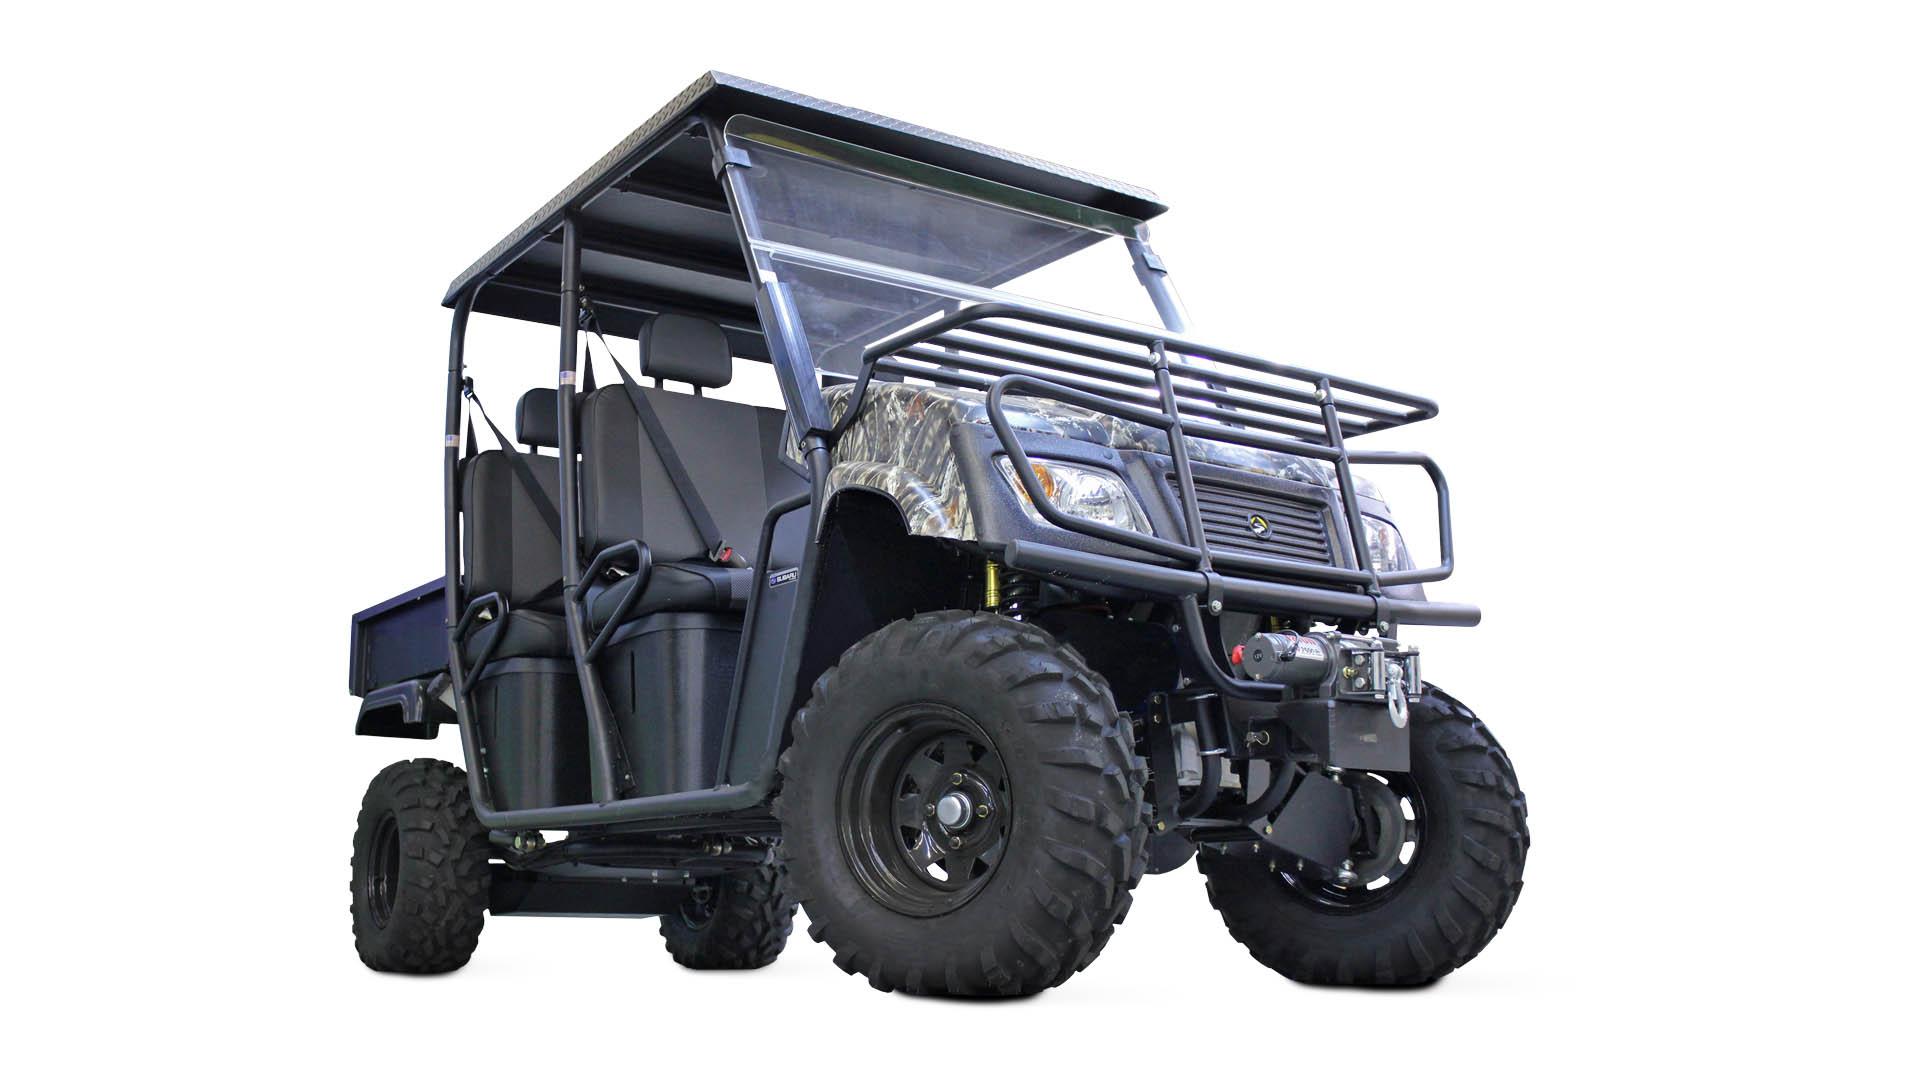 American Sportworks Landmaster UTV – LMC4P Predator Crew Hybrid